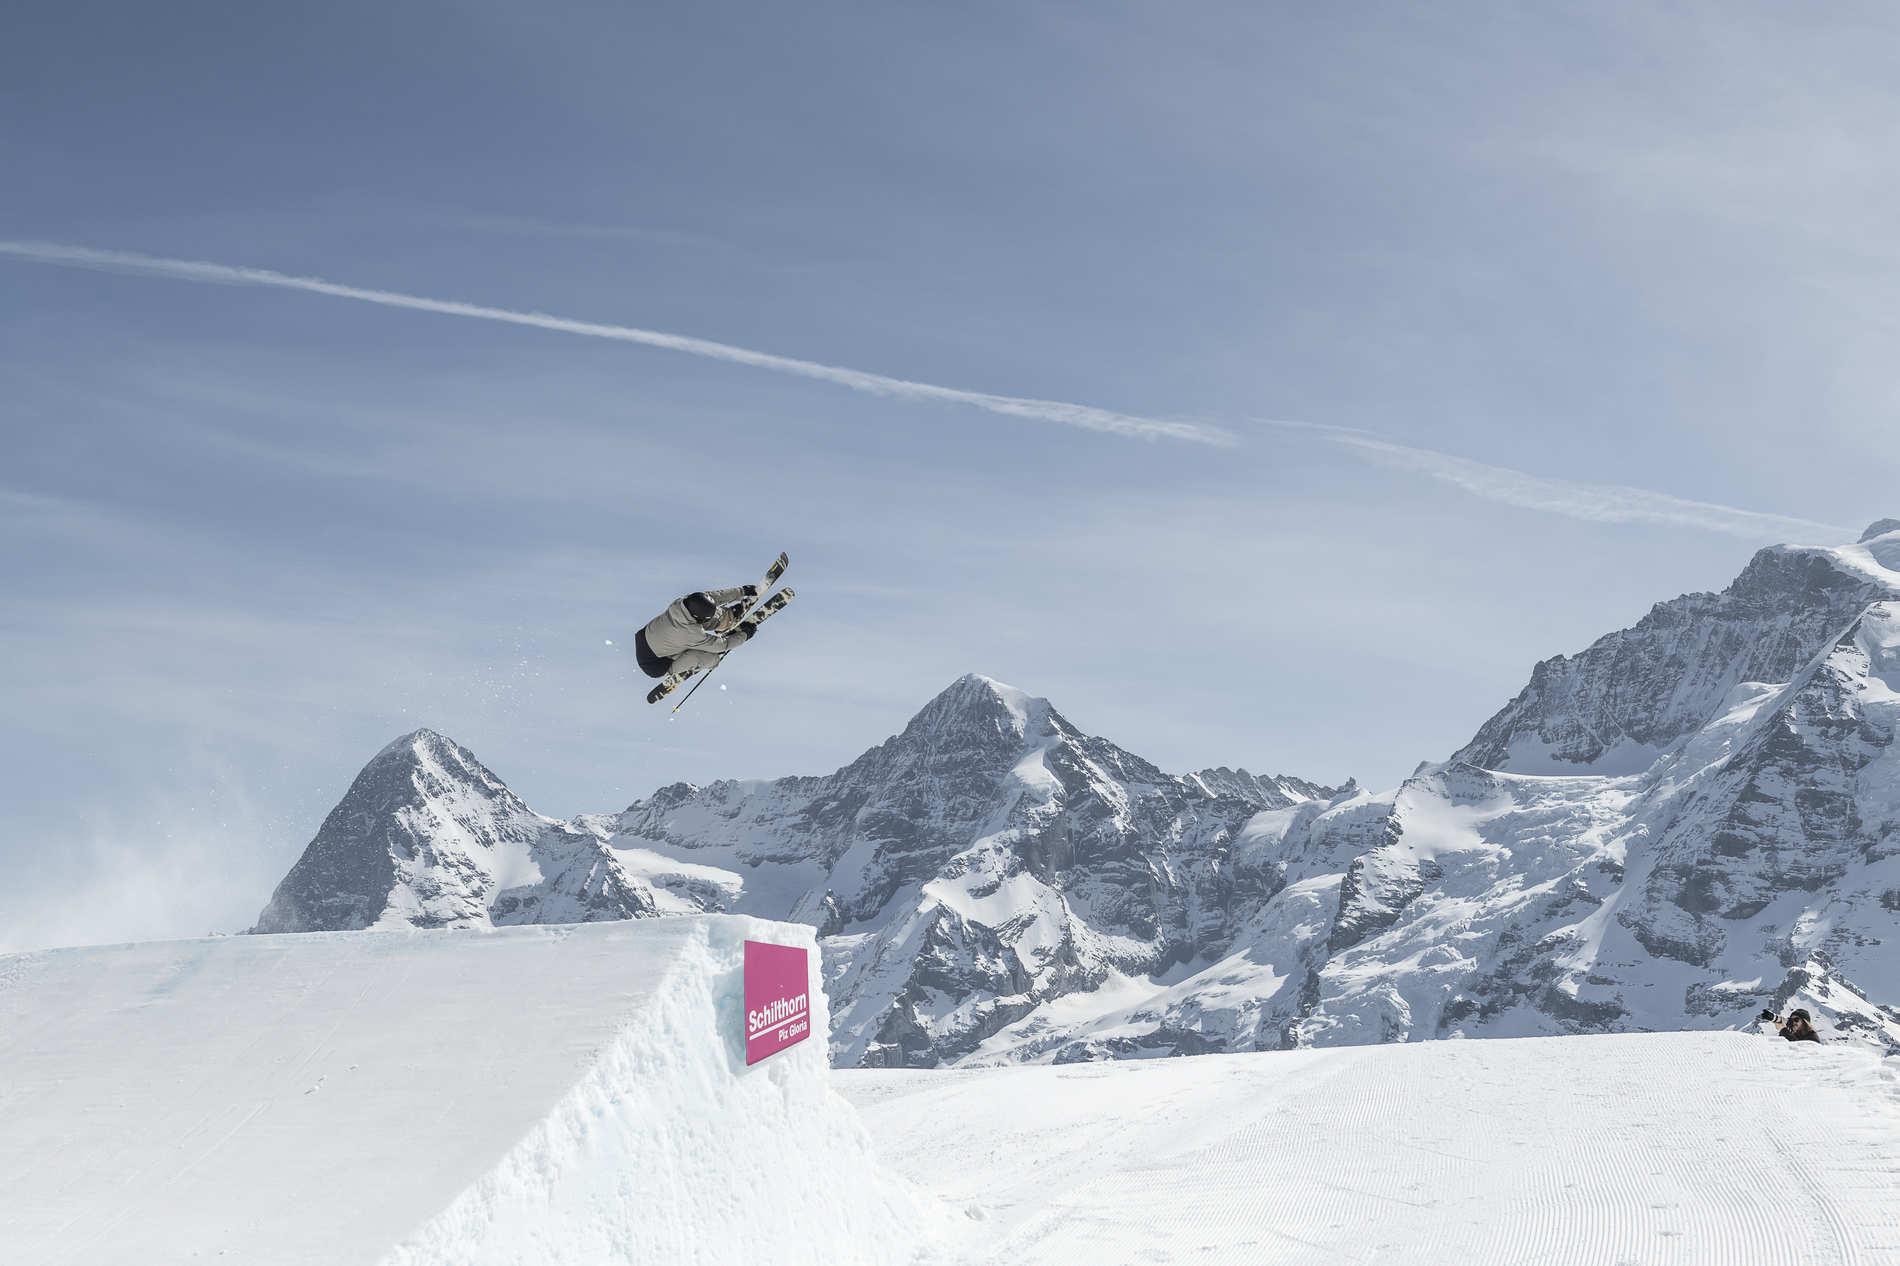 web schilthorn 29 03 2021 action fs sb unknown michael donadel snowpark 021